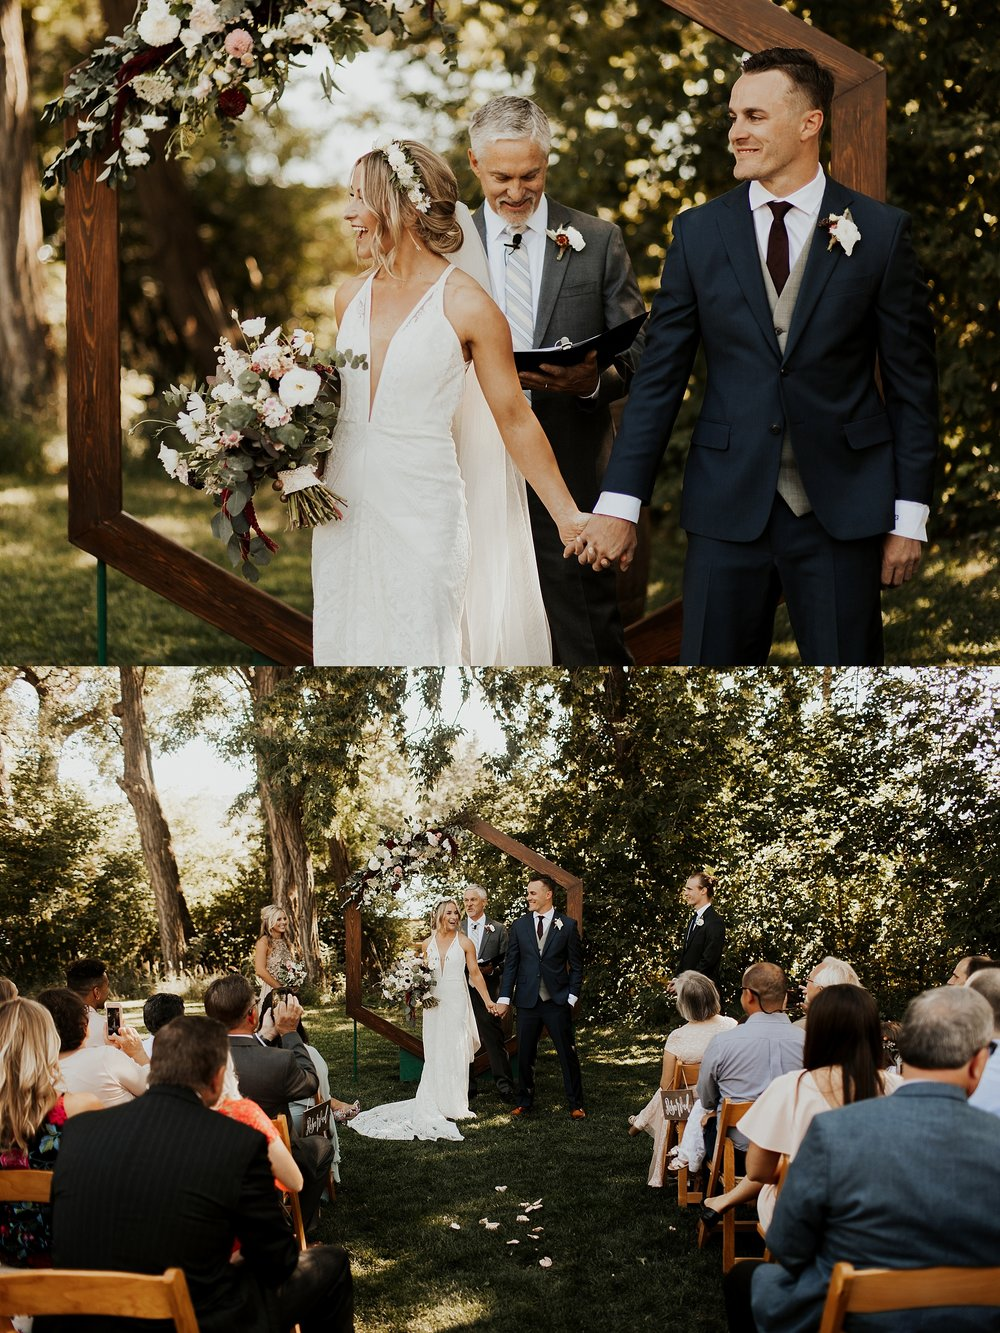 Lyons_Farmette_Wedding_Denver_Colorado_wedding039.JPG